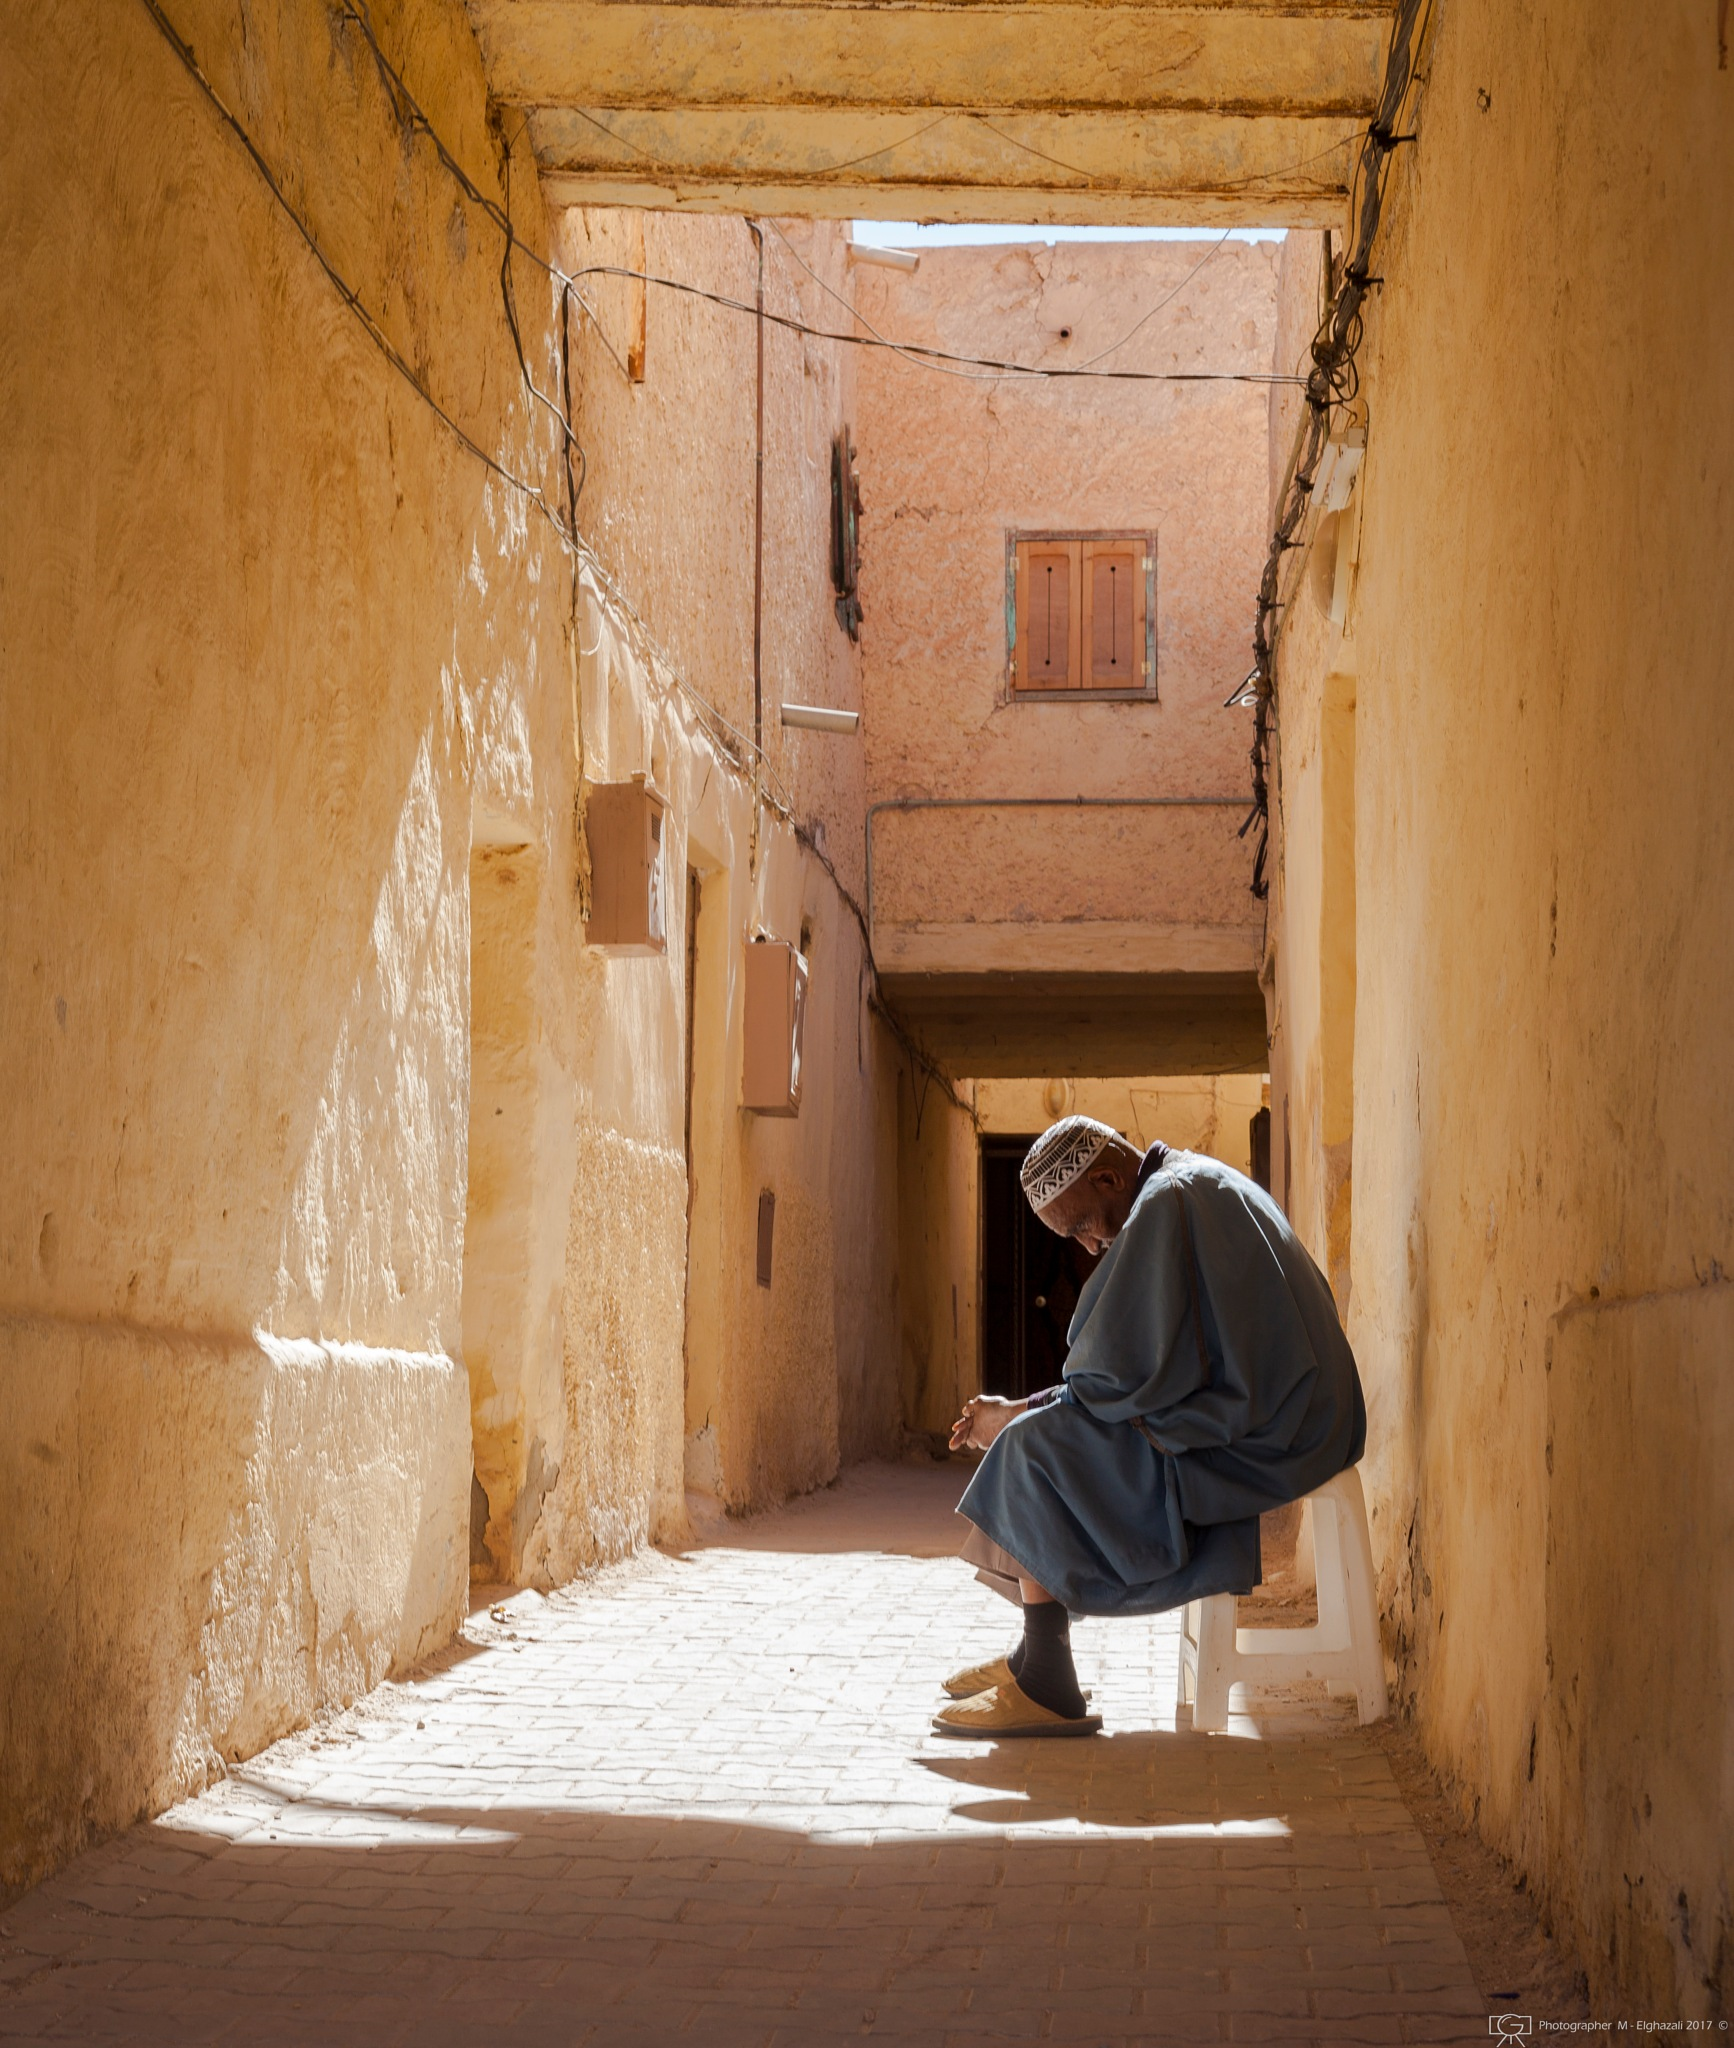 Old man in Old Building  by Merzaki Mohammed Elghazali